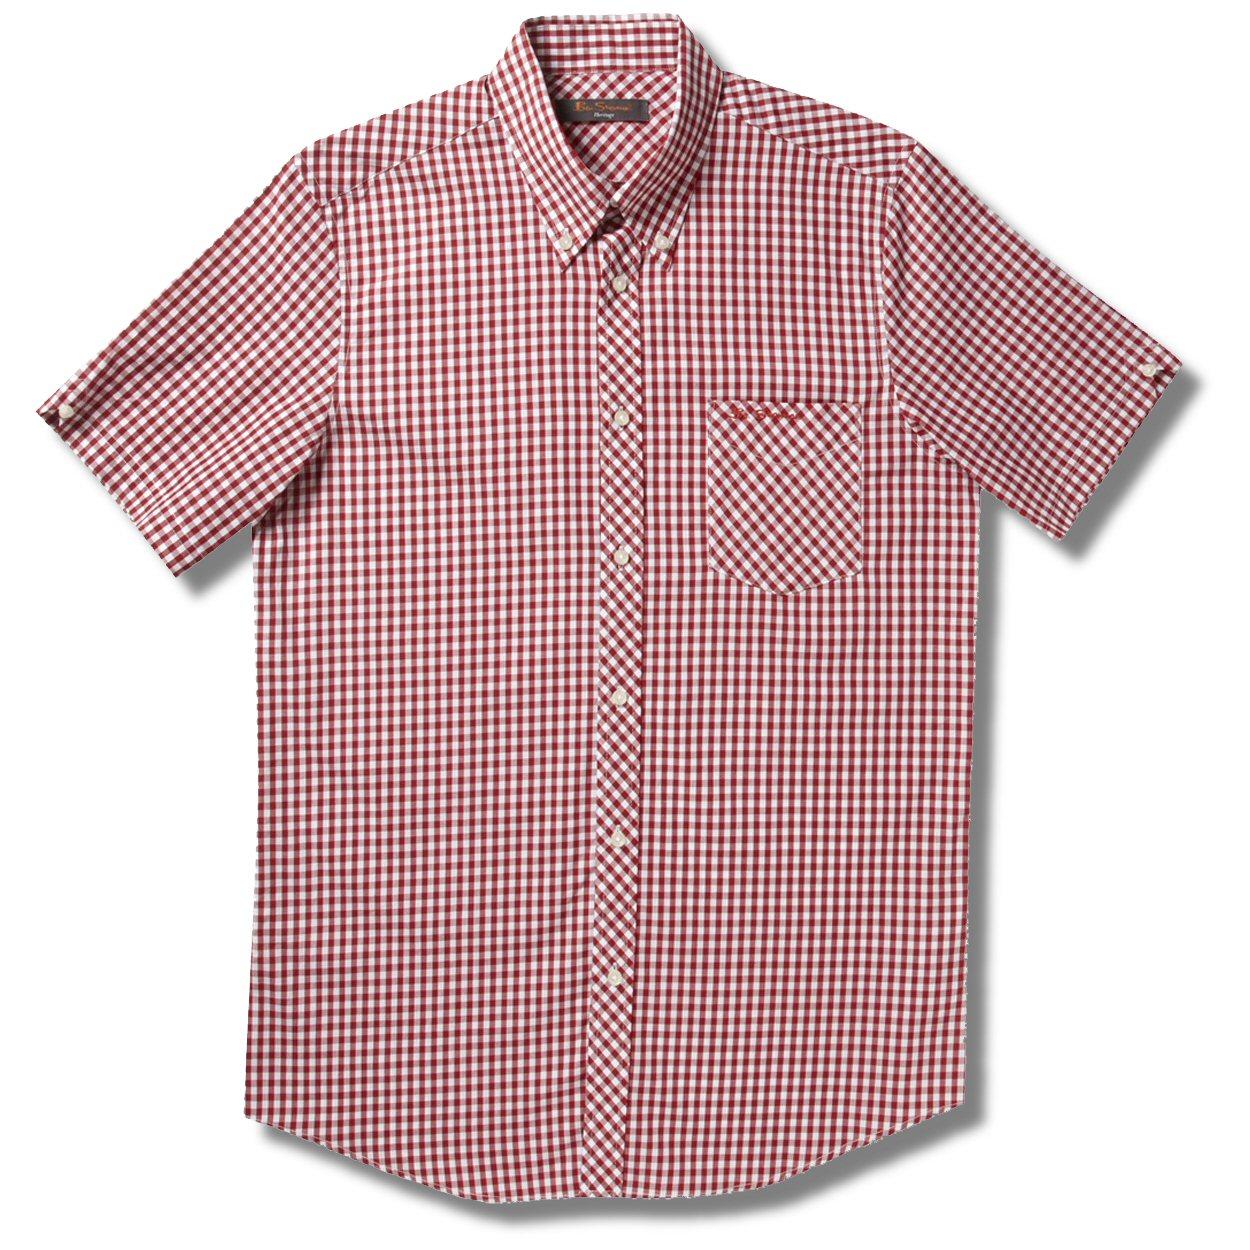 Ben Sherman Mod Skin Gingham Check Short Sleeve Shirt Red